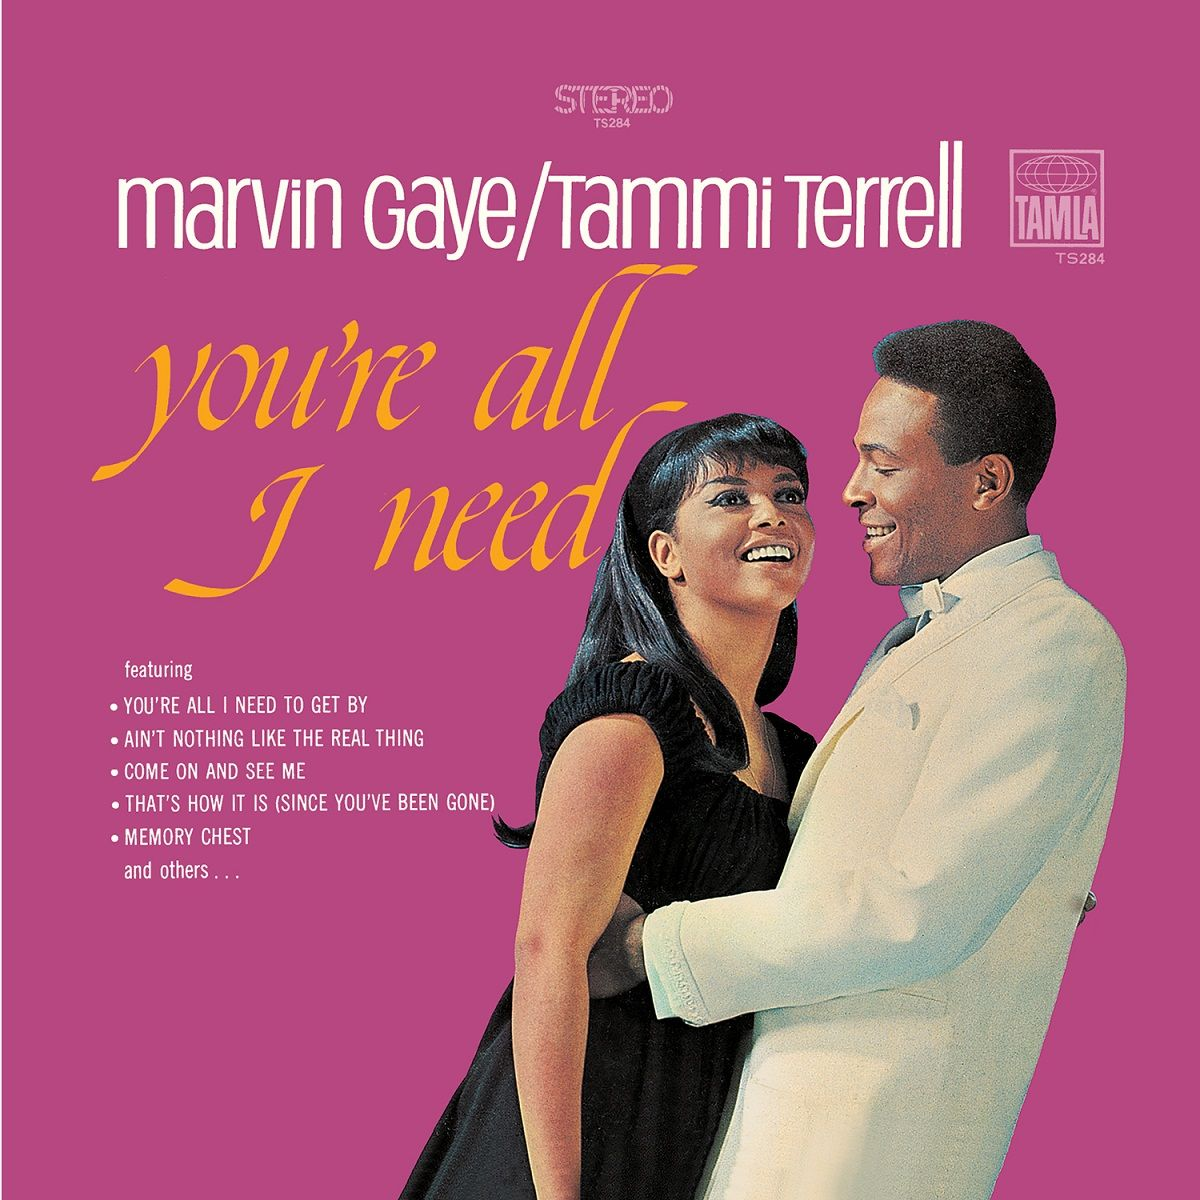 united marvin gaye tammi terrell album